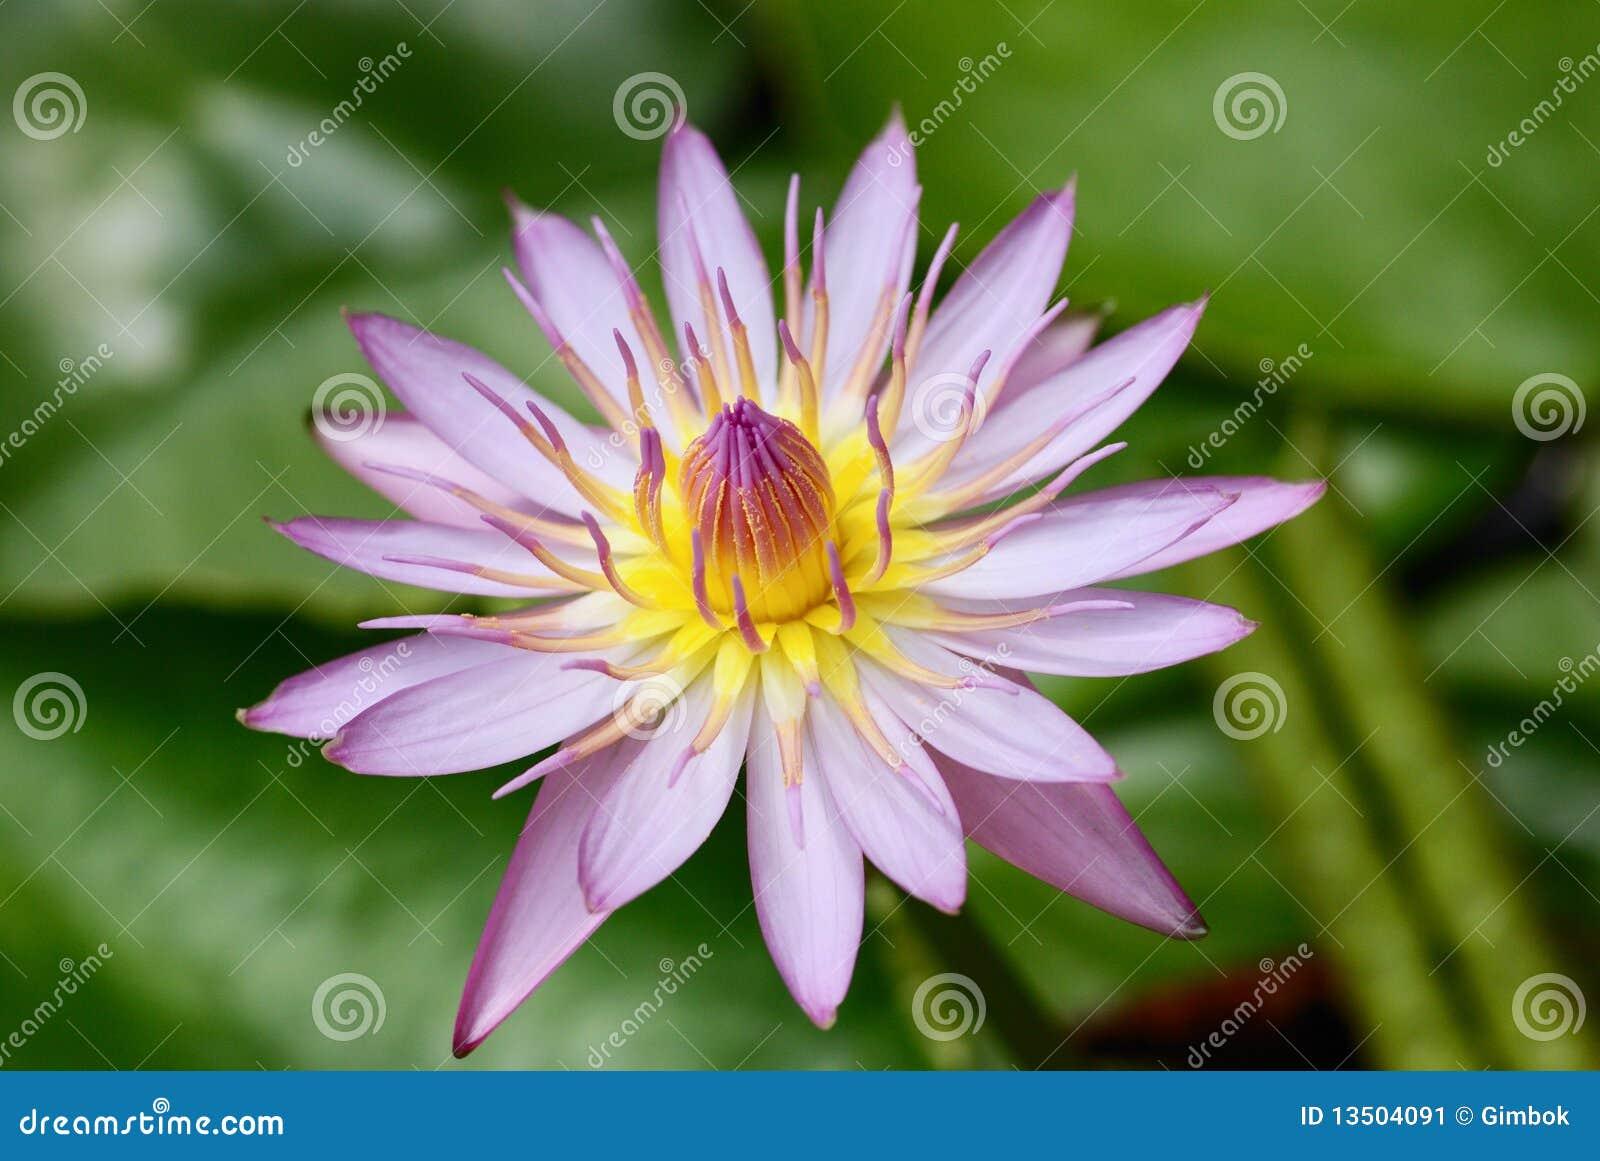 Purple Water Lily Flower Stock Image | CartoonDealer.com ...